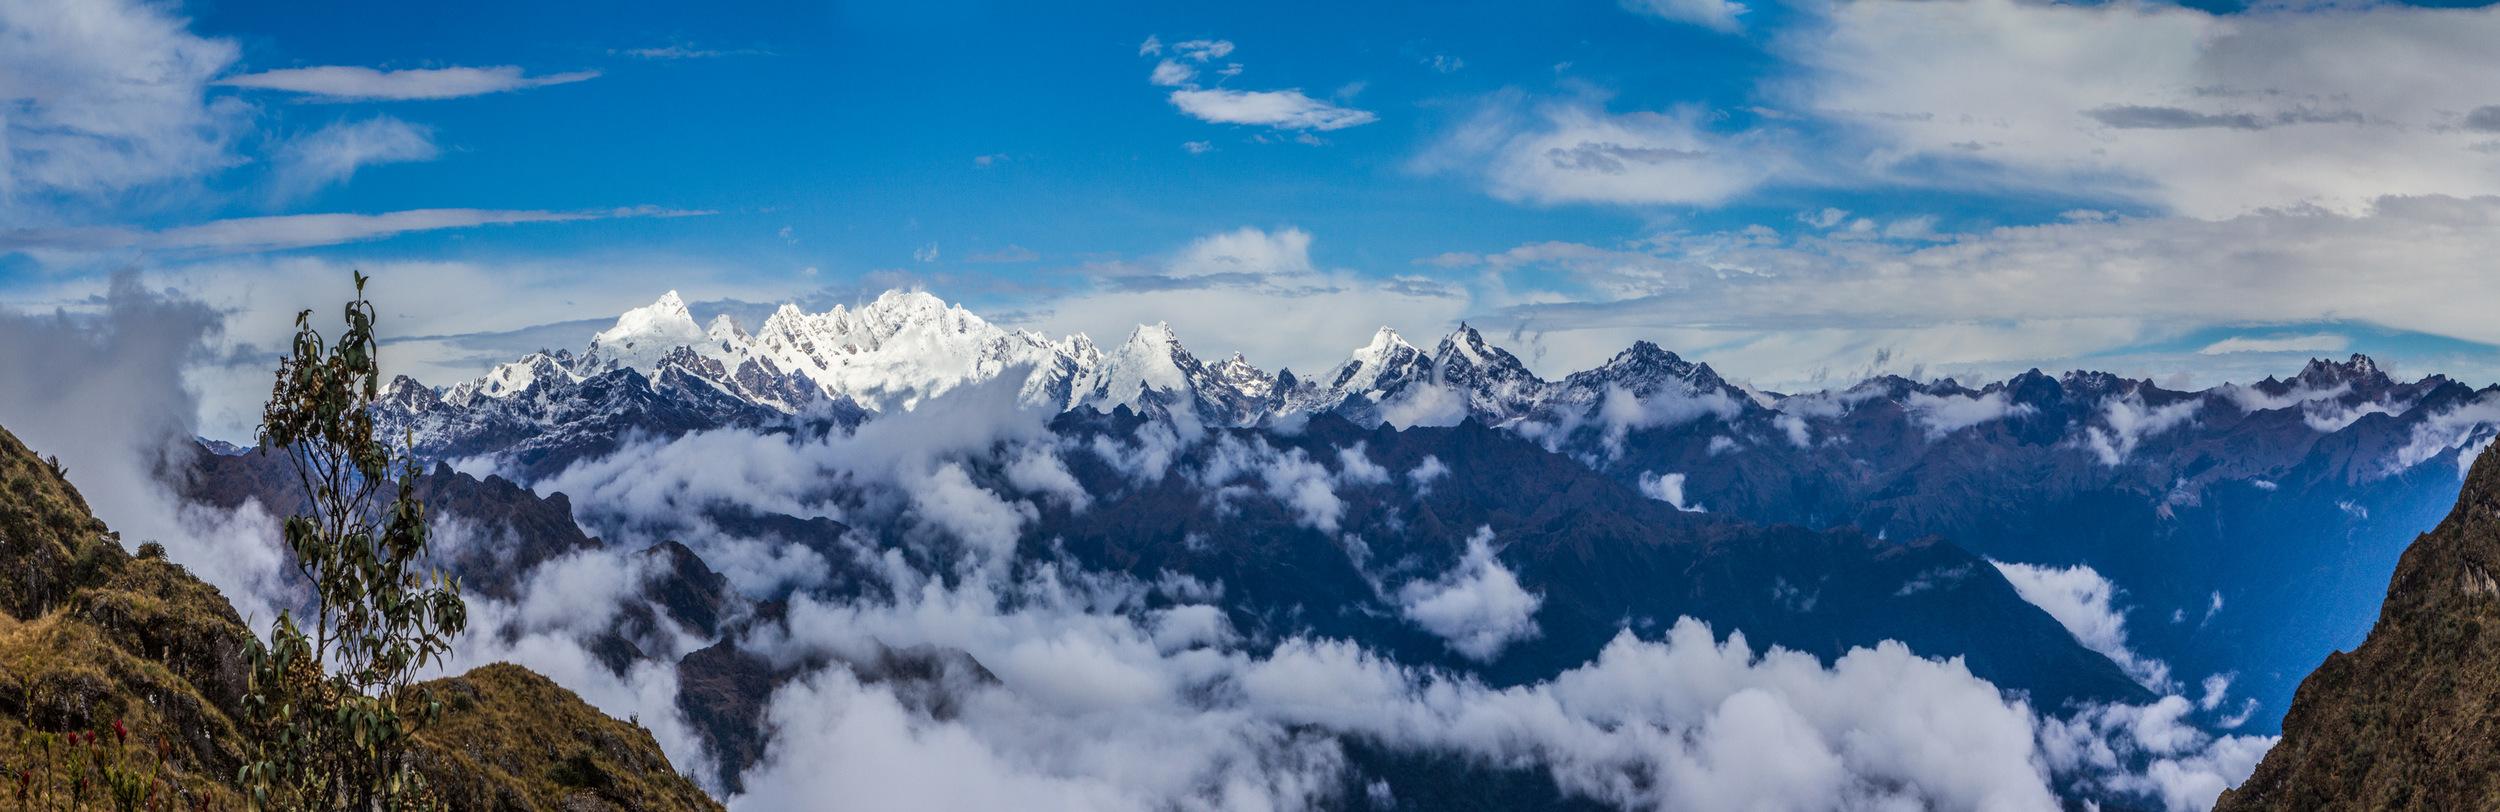 Ali-Barqawi-Studios-Explore-Series-Travel-Adventure-Documentary-C4CGAZA-Peru-MachuPicchu-2015-746.jpg